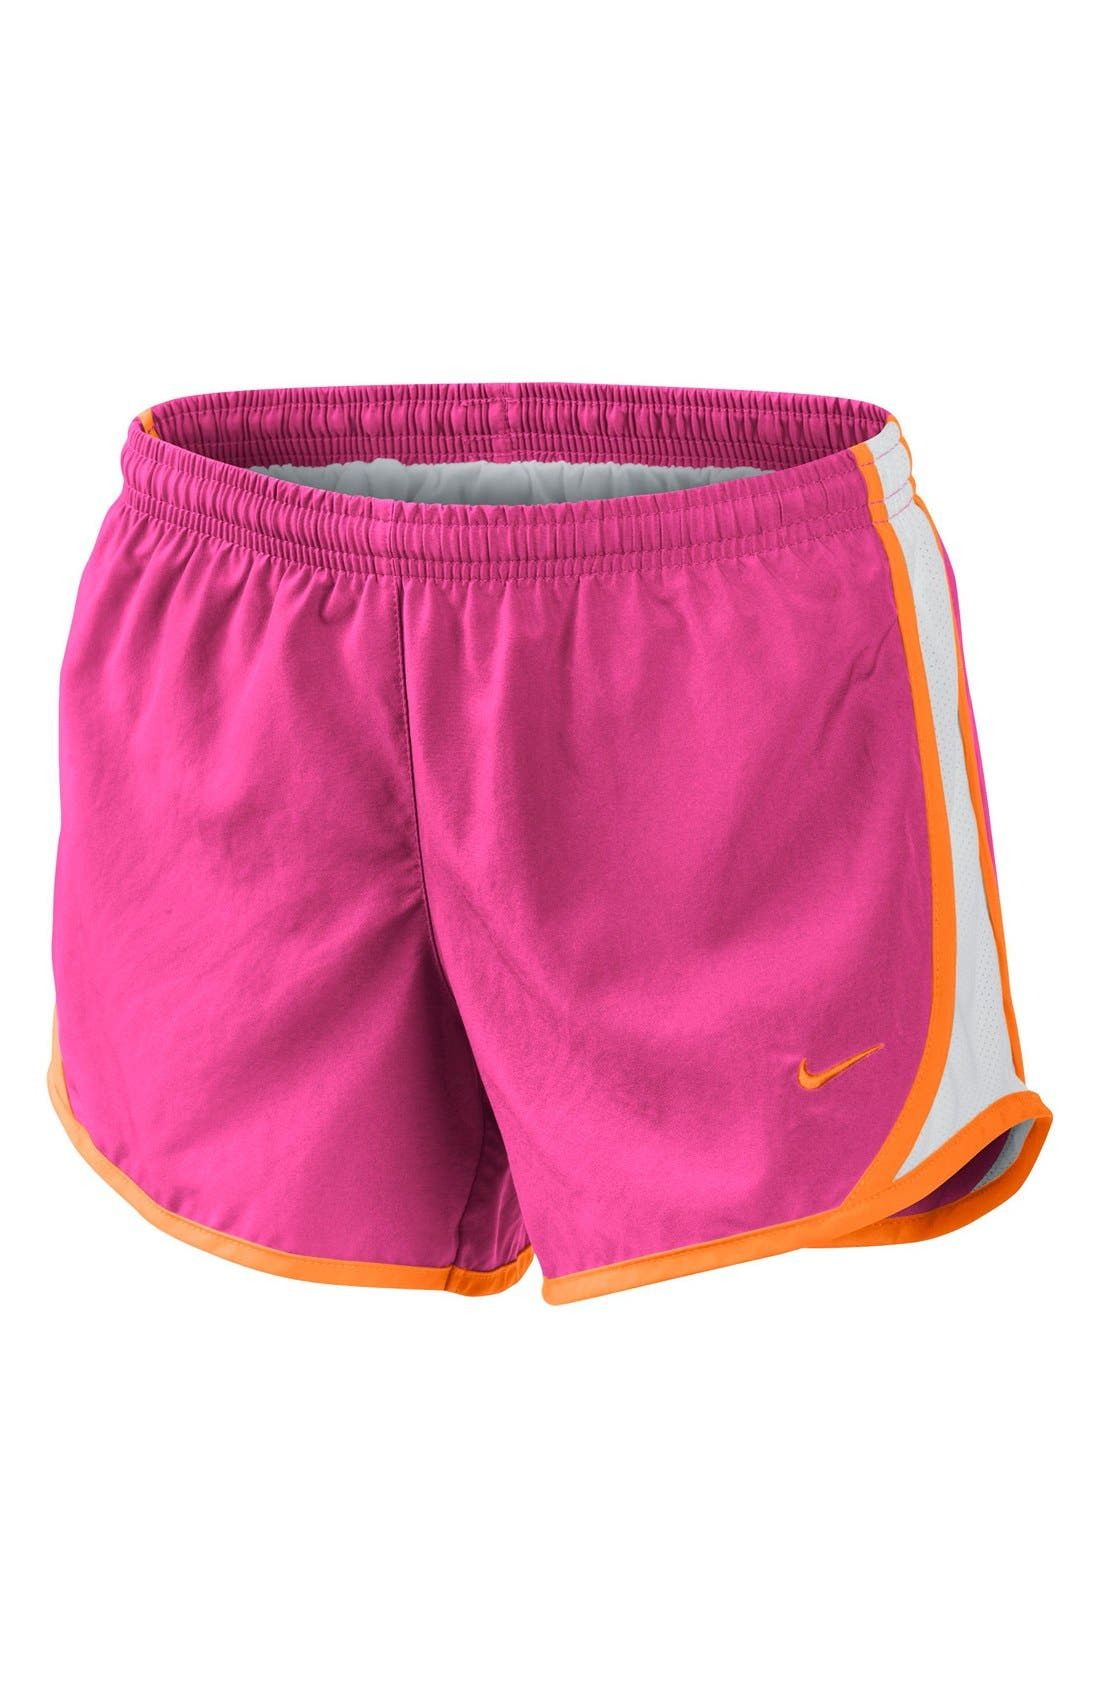 Main Image - Nike 'Tempo' Track Shorts (Big Girls)